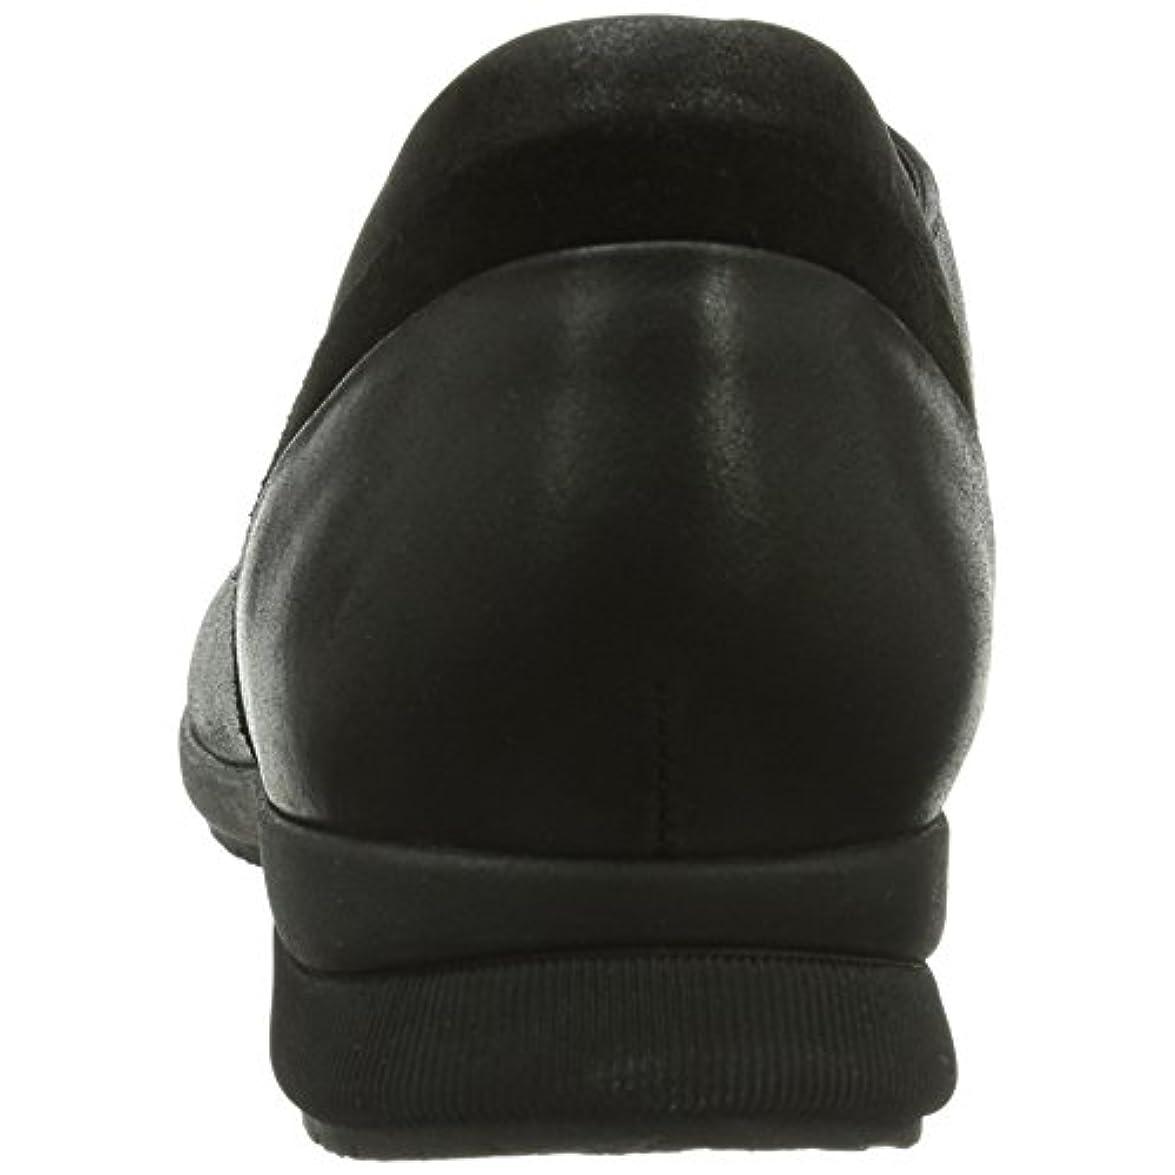 Mephisto Joana Steve 2600 sc 8100 or 10500 Black Scarpe Stringate Basse Derby Donna